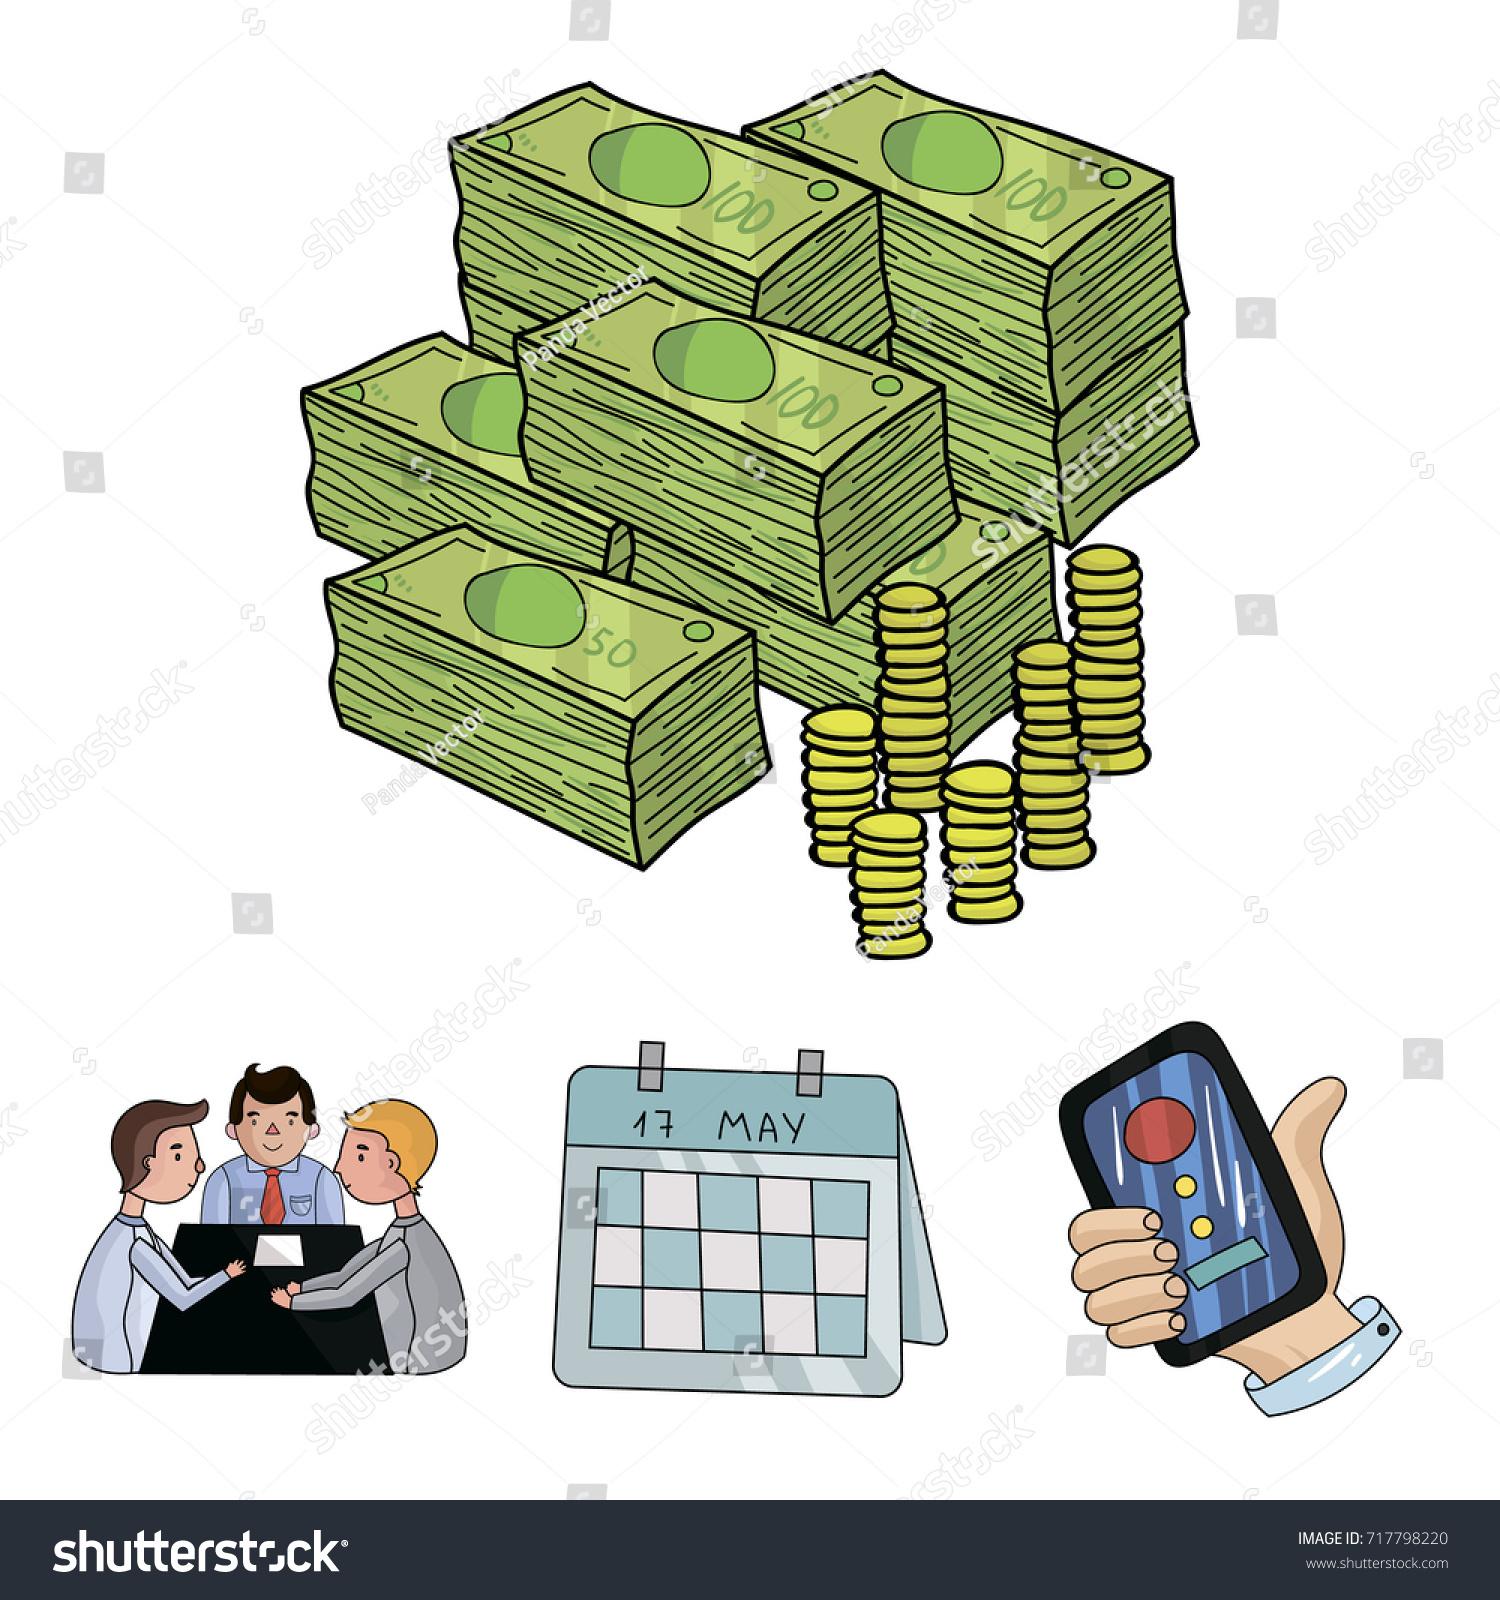 Calendar Telephone Conference Agreement Cashbusinessconference